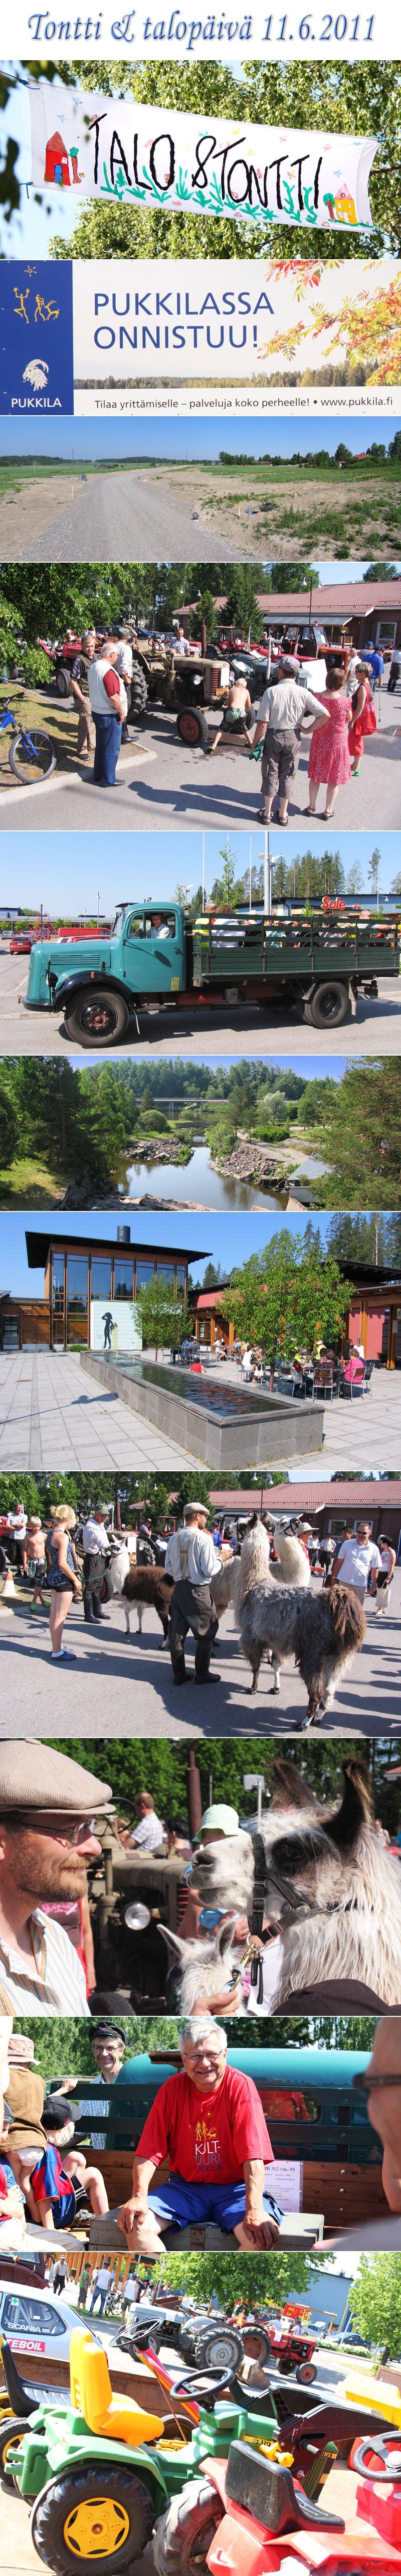 Talo ja tontti 2011